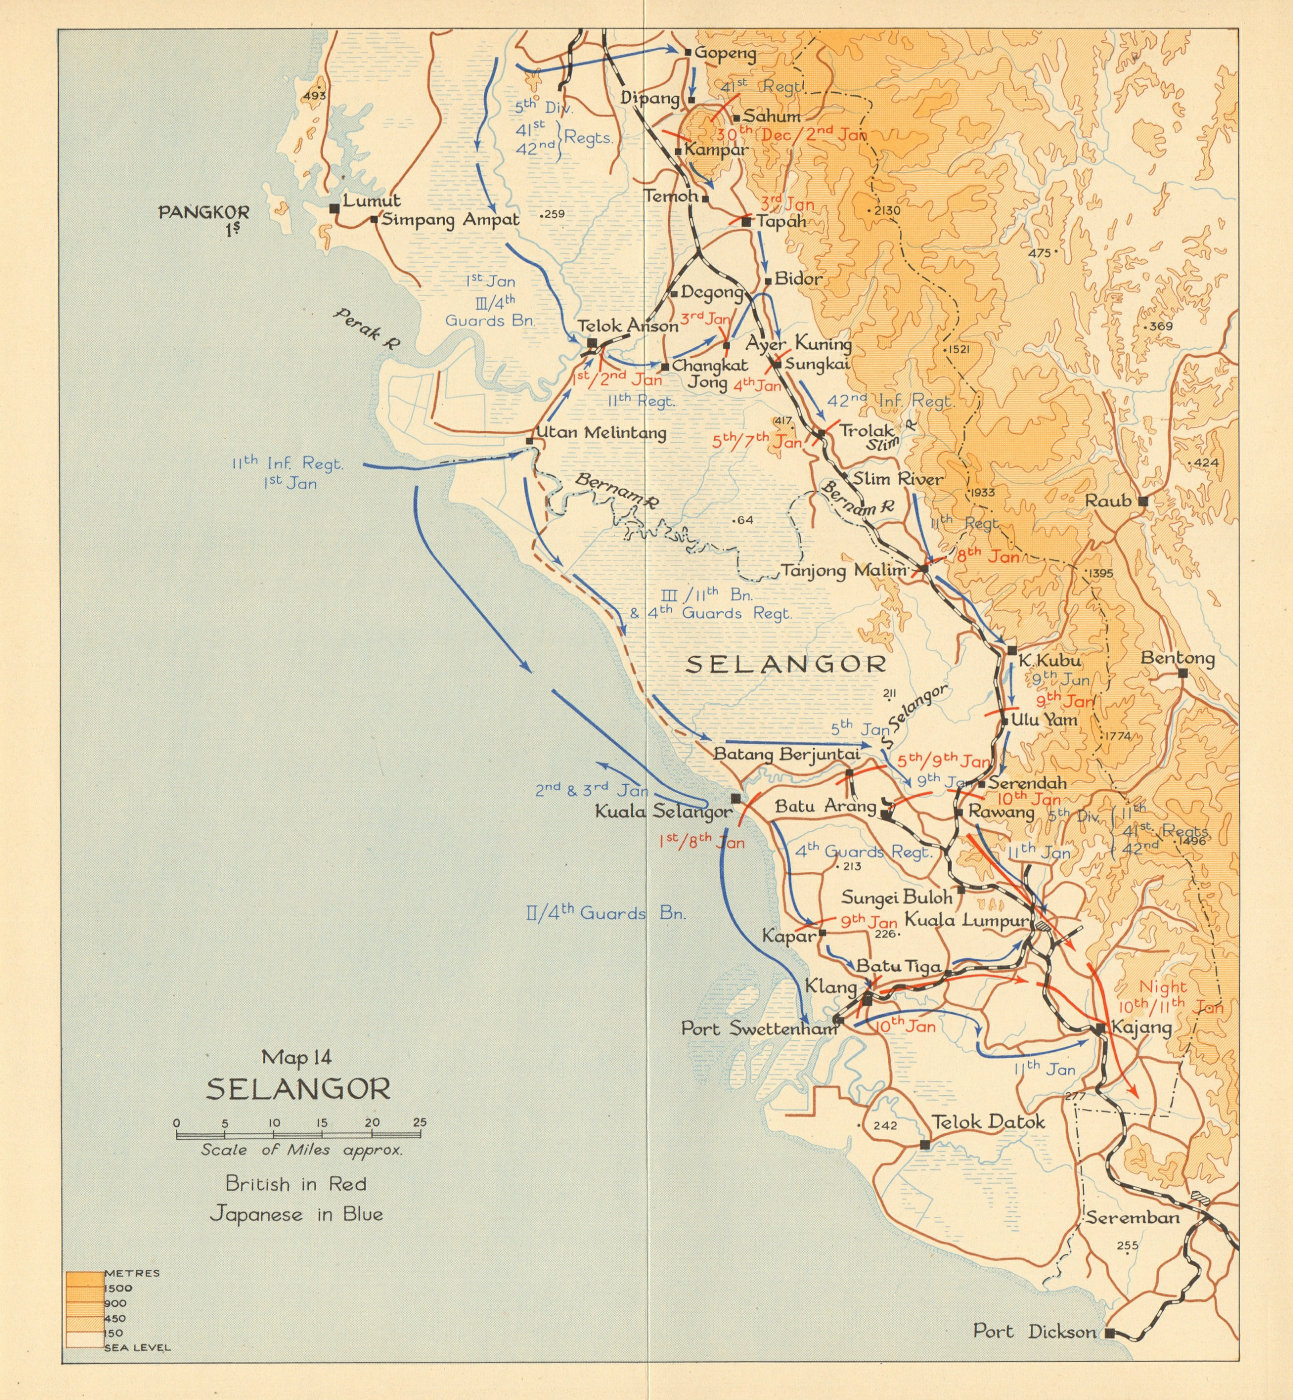 Associate Product Selangor. Japanese invasion of Malaya 1942. Malaysia 1957 old vintage map